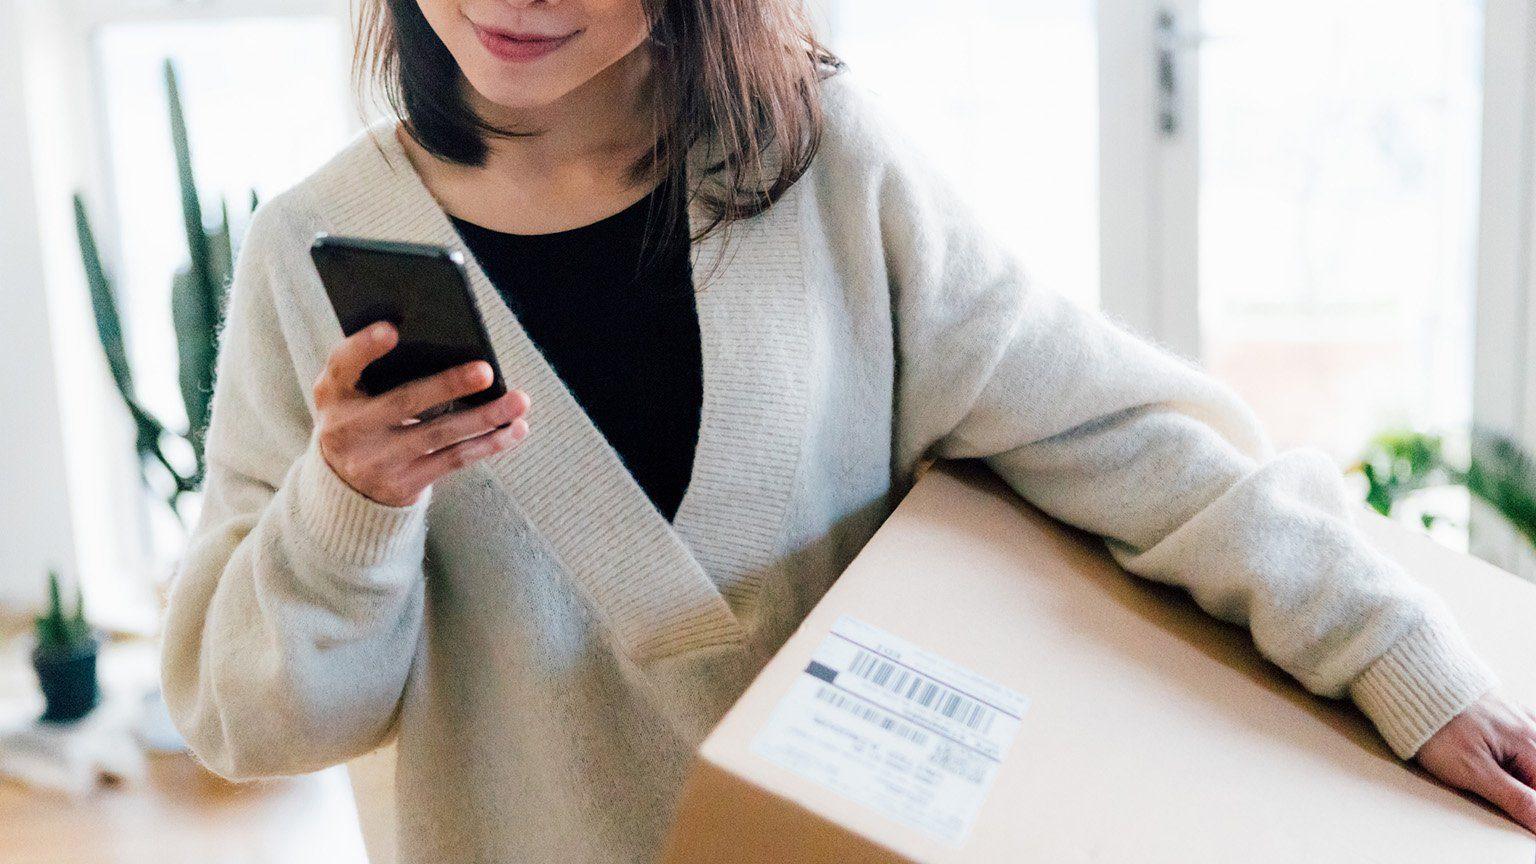 Woman smiling receiving parcel